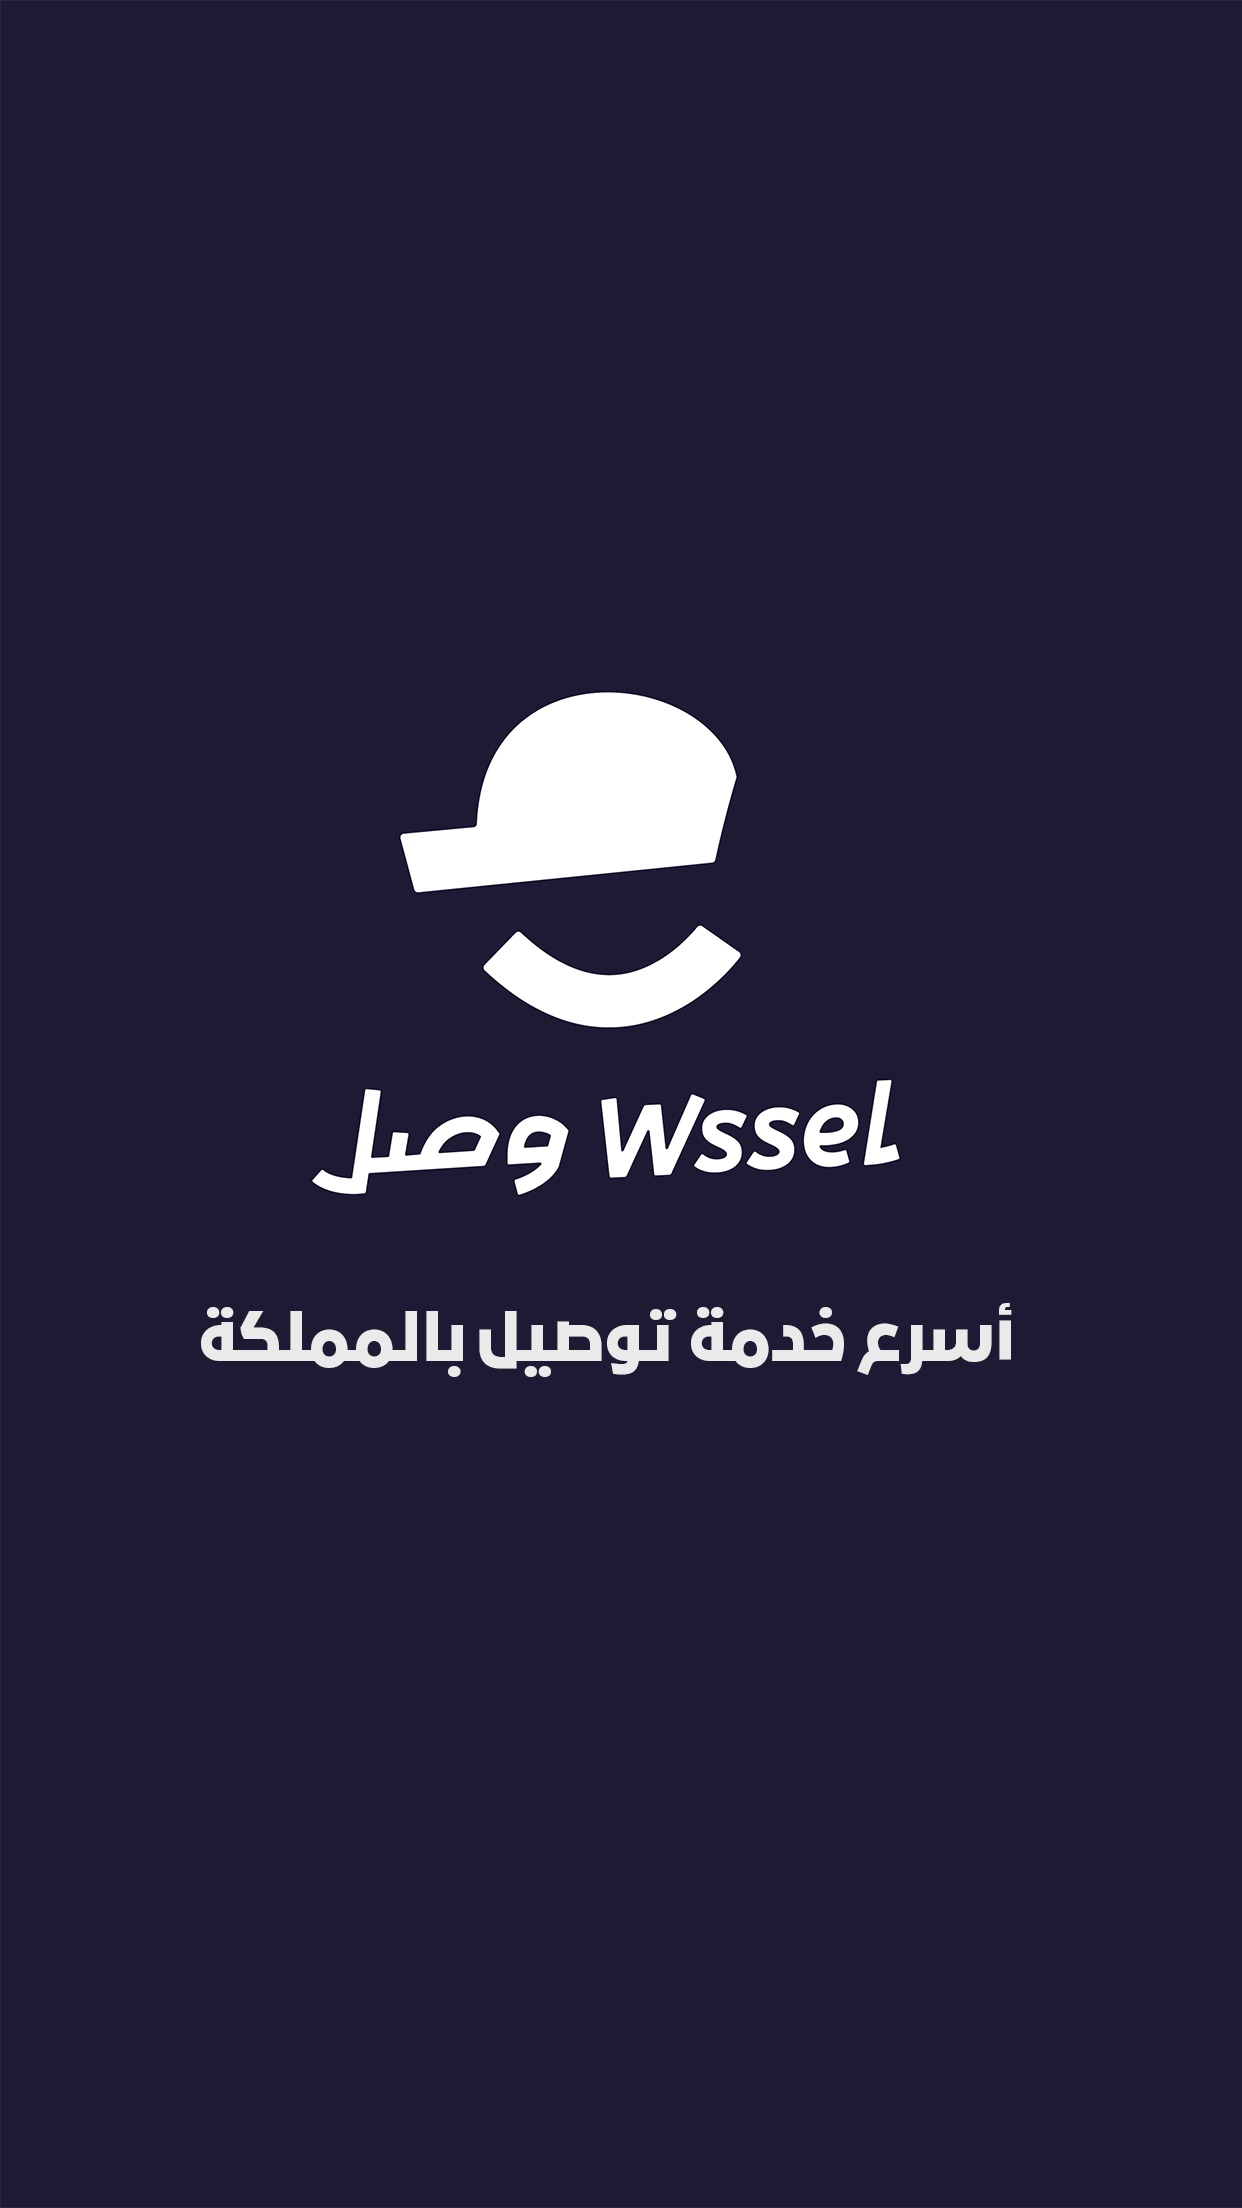 Wssel وصل Screenshot